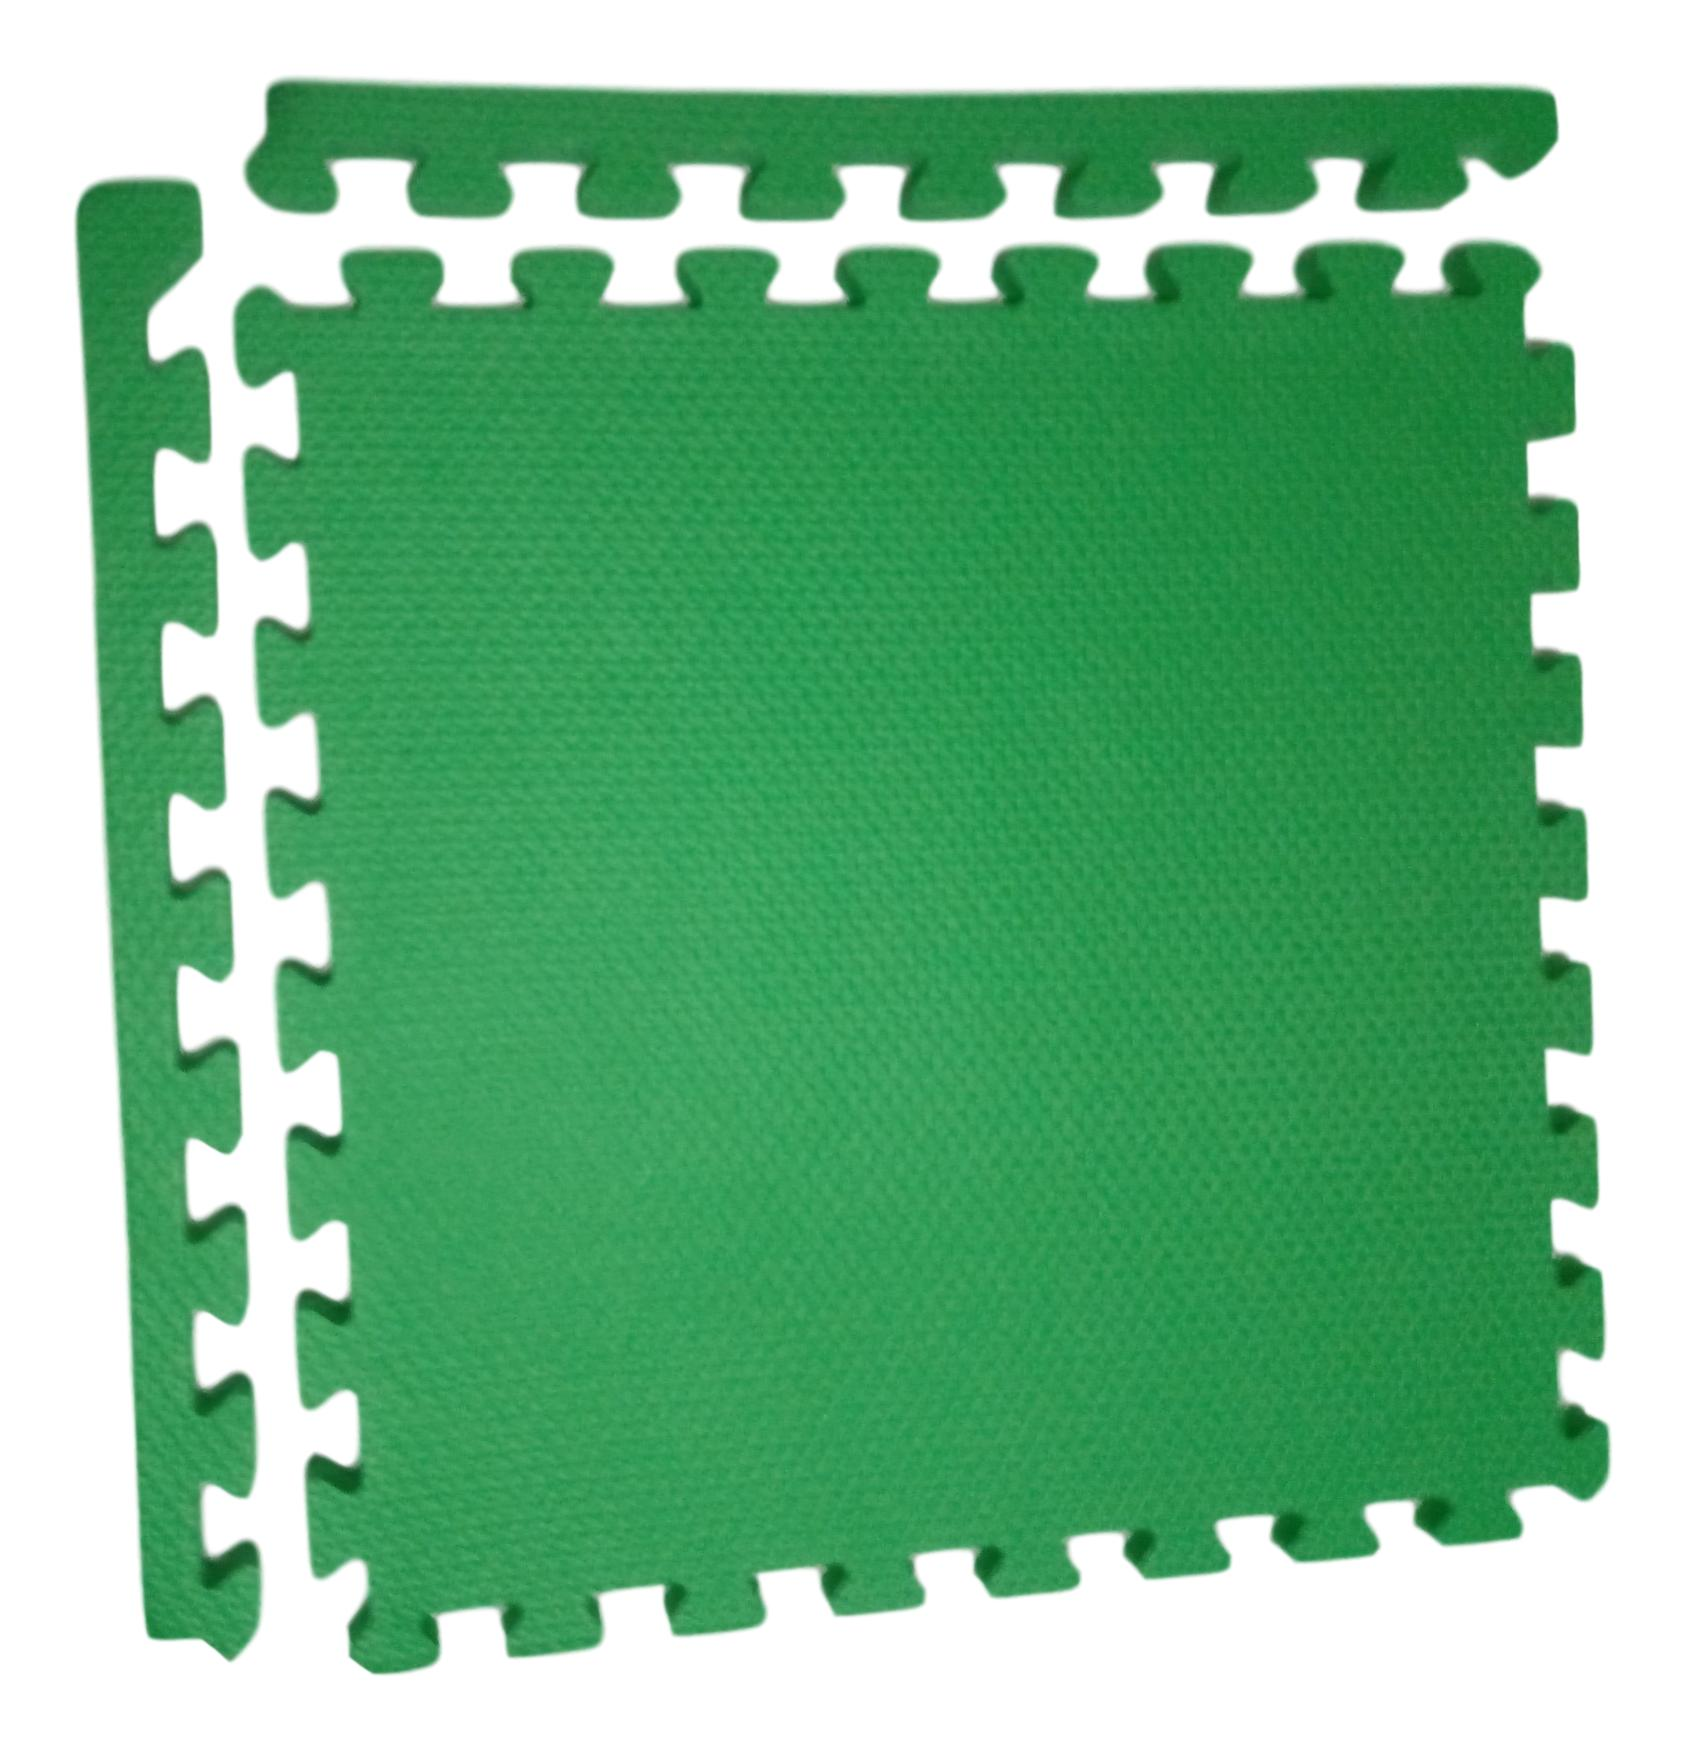 Kit 04 Tapetes Tatames Coloridos Eva 50cm X 50cm X 15mm C/ Borda